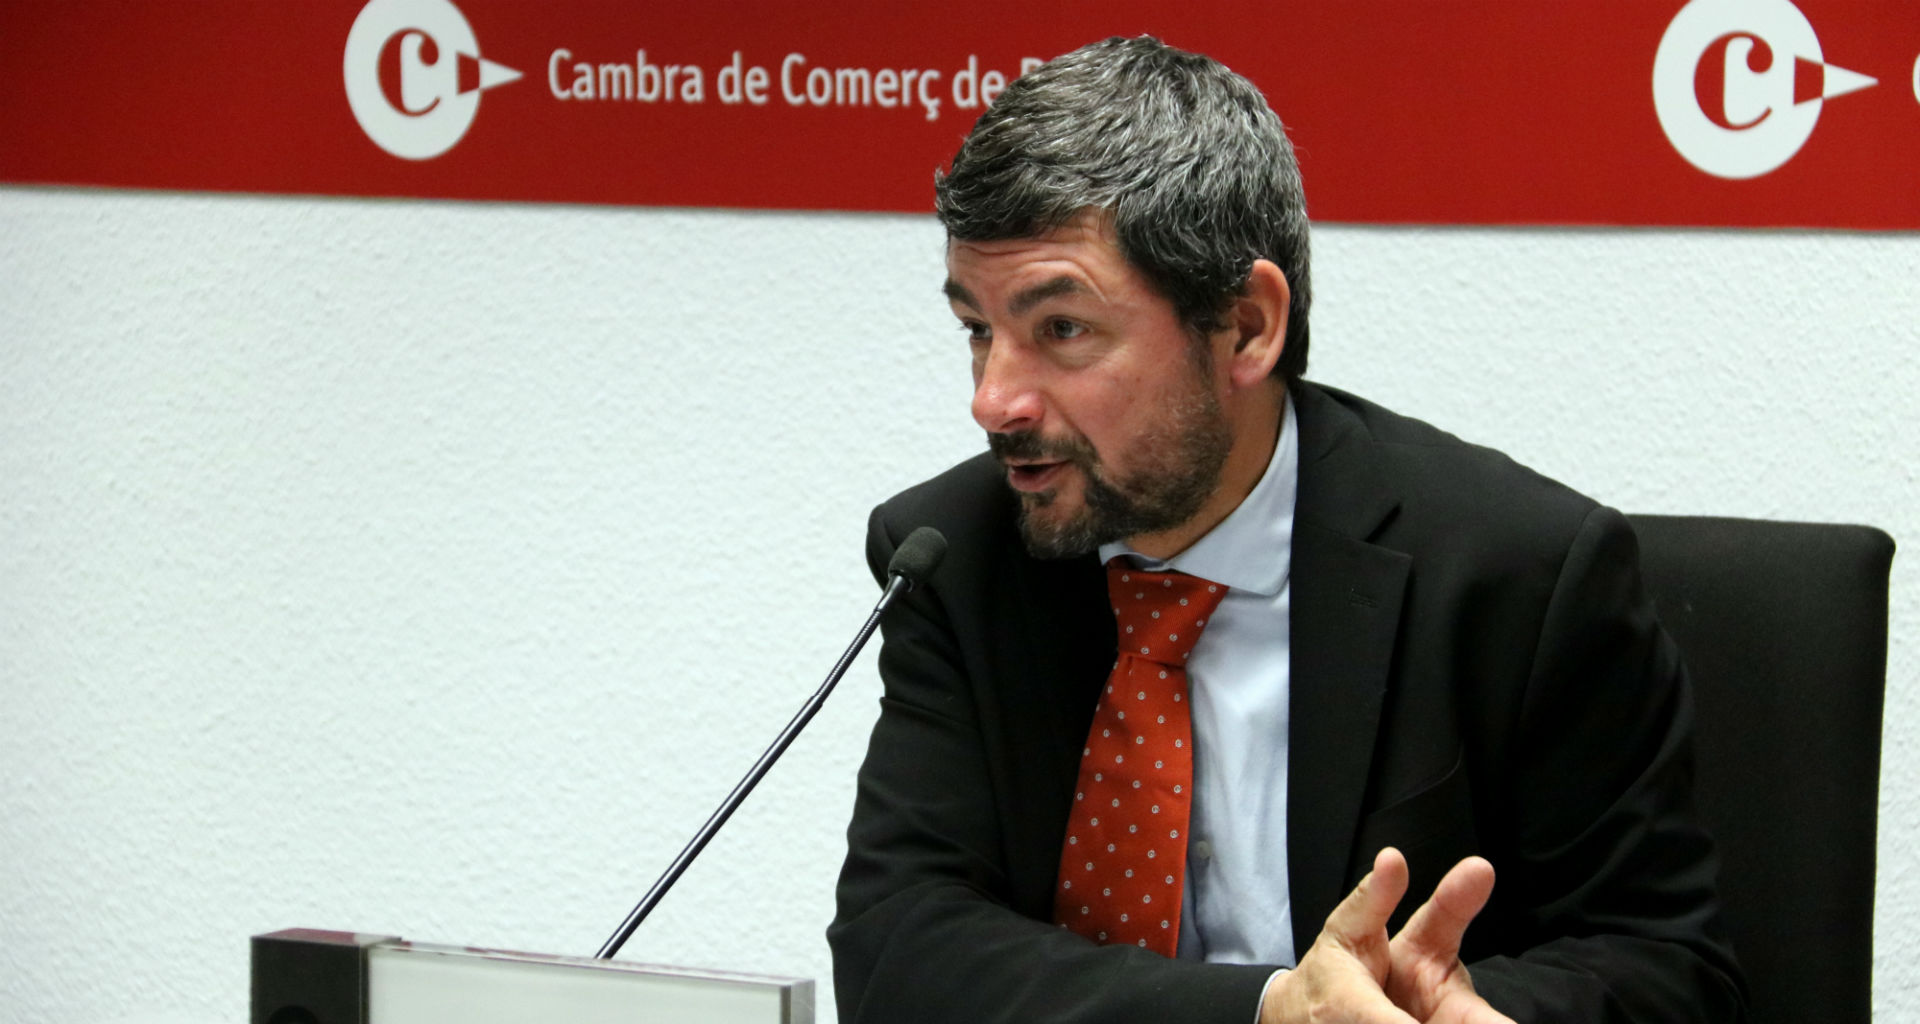 Joan Canadell, president de la Cambra de Comerç de Barcelona